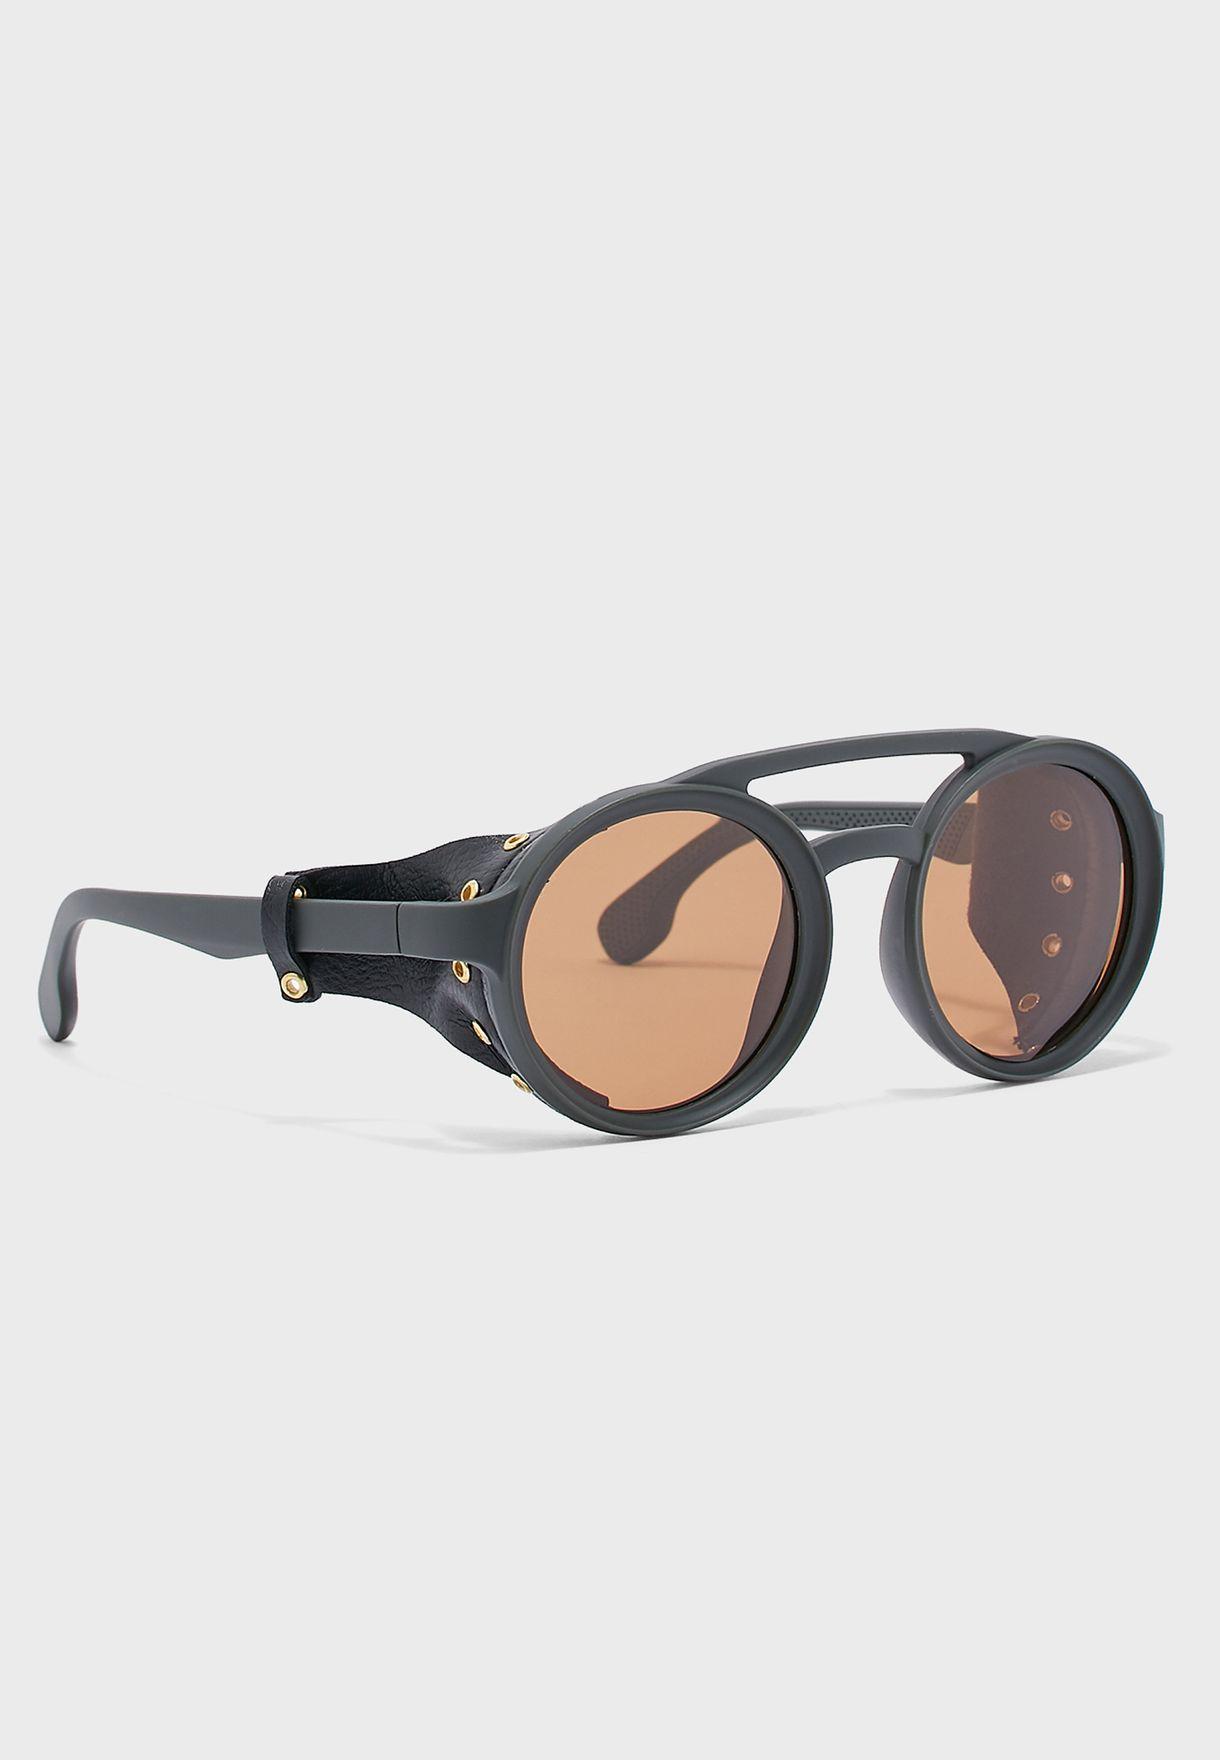 e9690448d Shop Seventy five yellow Steampunk Summer Round Sunglasses SS19705 ...